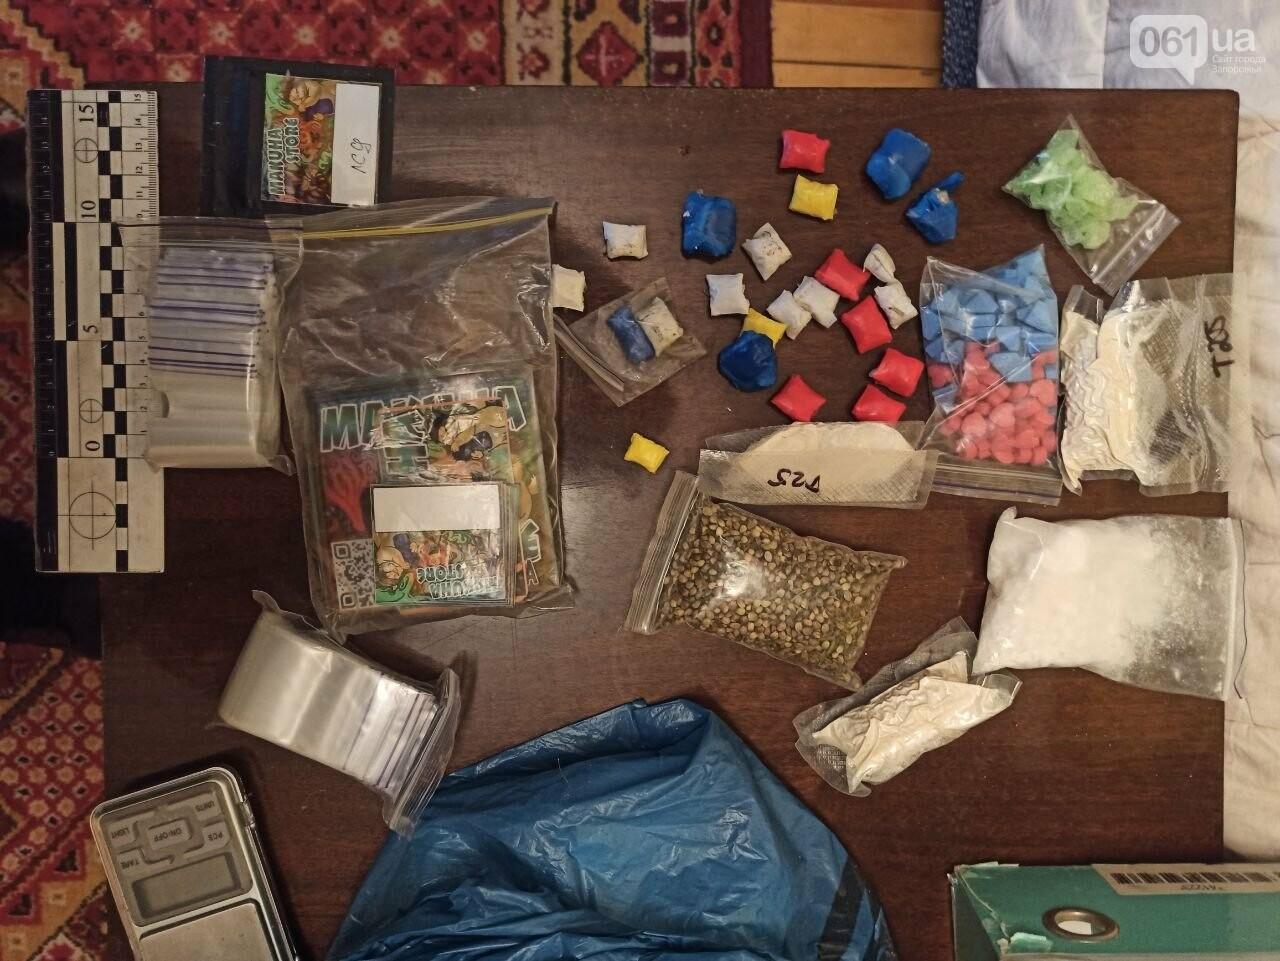 В Запорожье под суд отправят мужчину, который получал на почте консервные банки с наркотиками, фото-4